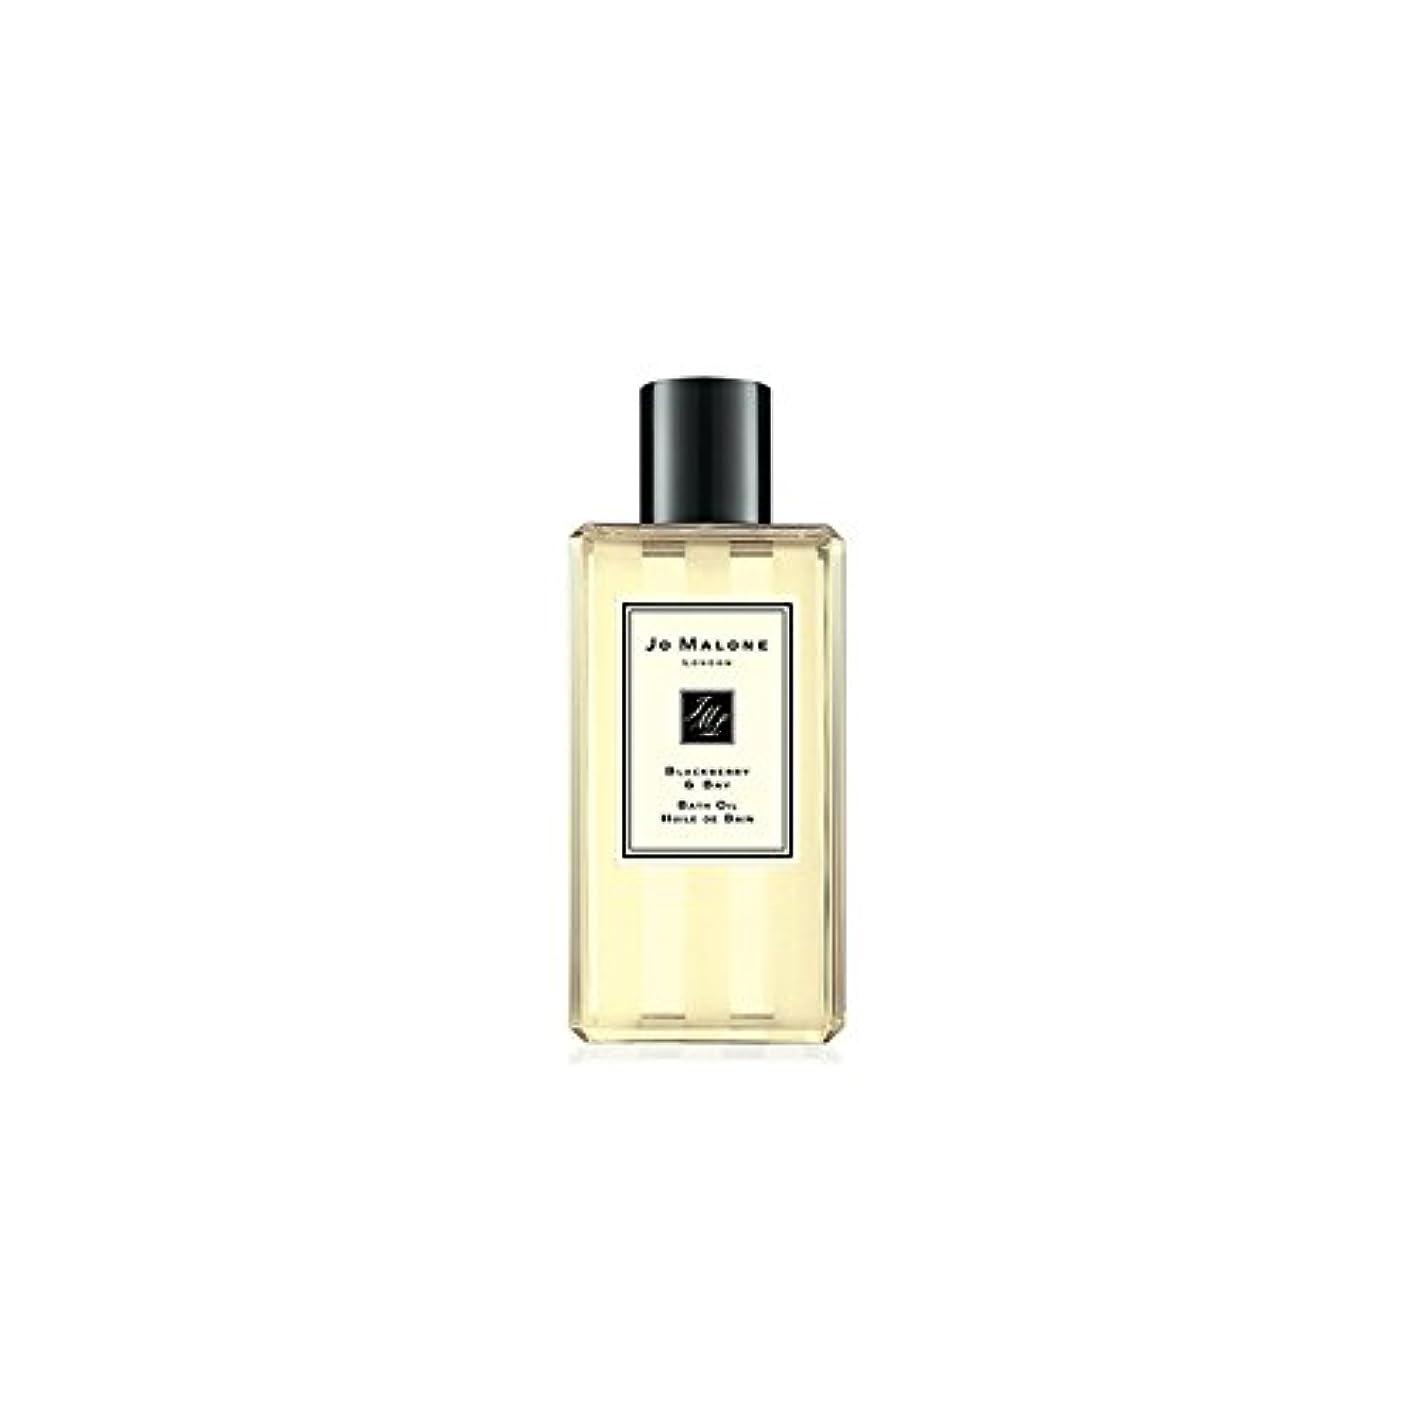 Jo Malone Blackberry & Bay Bath Oil - 250ml (Pack of 2) - ジョーマローンブラックベリー&ベイバスオイル - 250ミリリットル (x2) [並行輸入品]